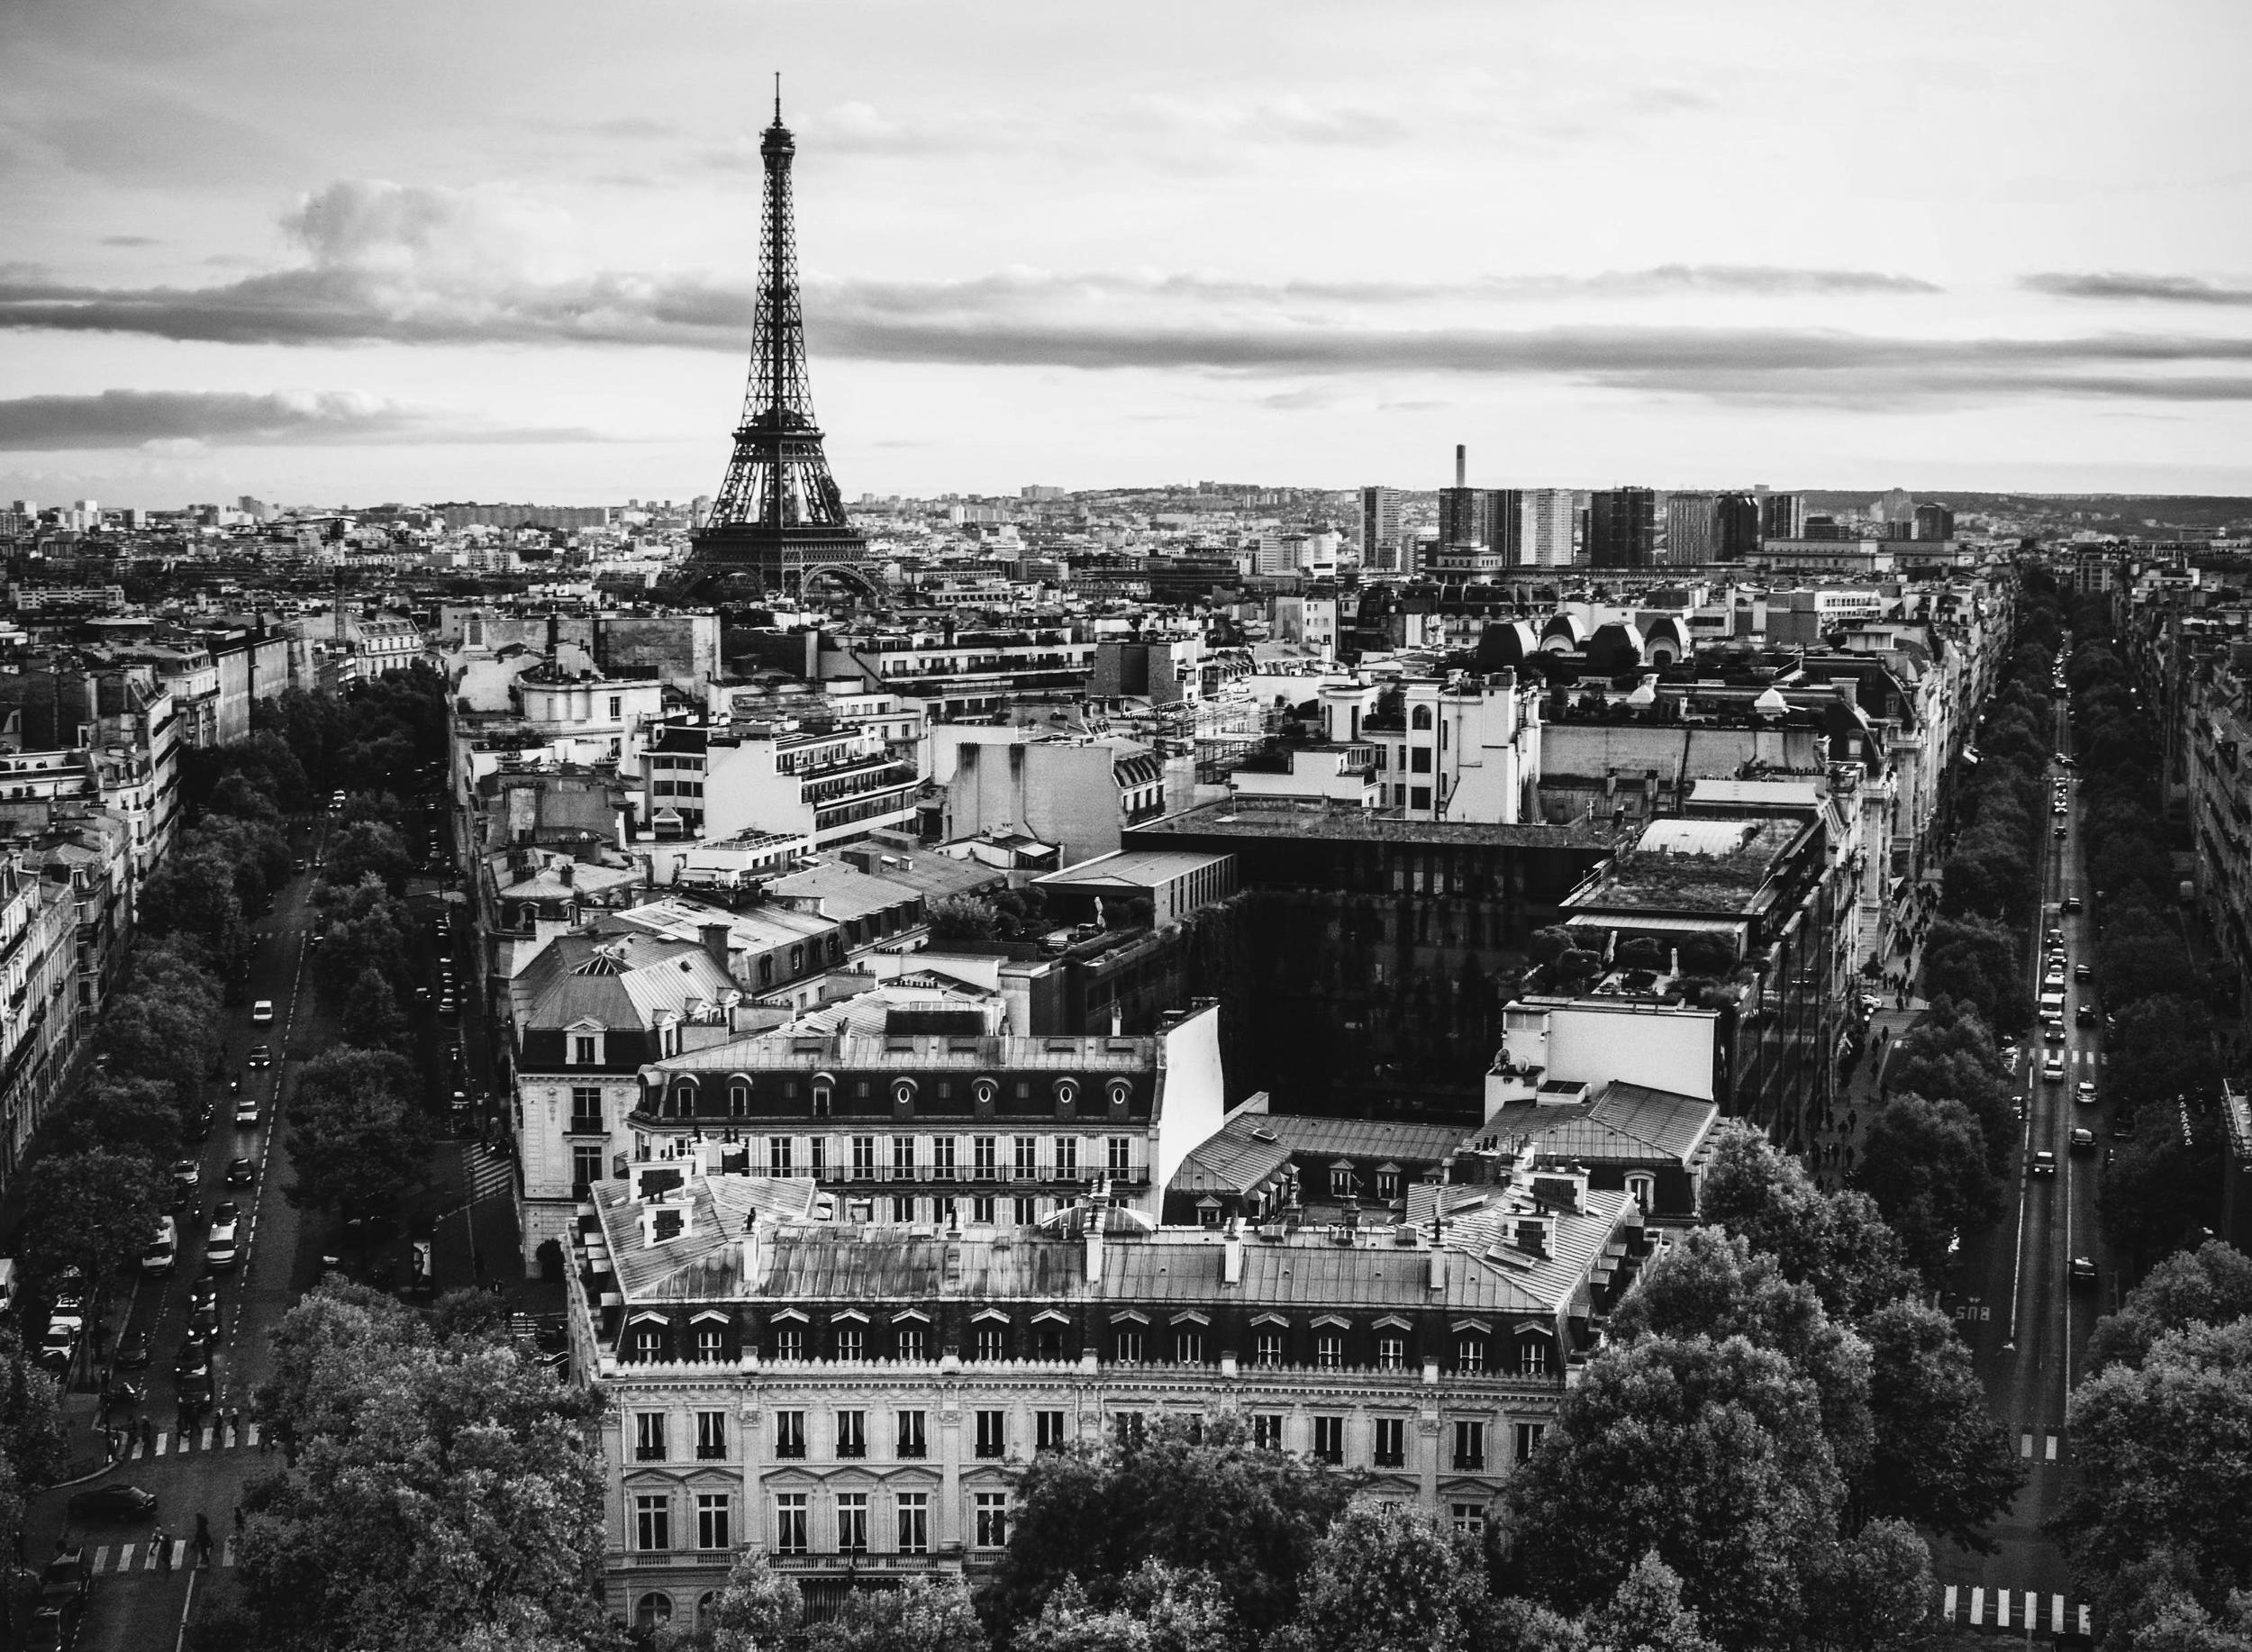 PARIS - 3 Rue Geoffroy-Marie, 75009 Paris+ 33 1 42 29 92 76c.becker@metis-international.comr.fleetwood@metis-international.com